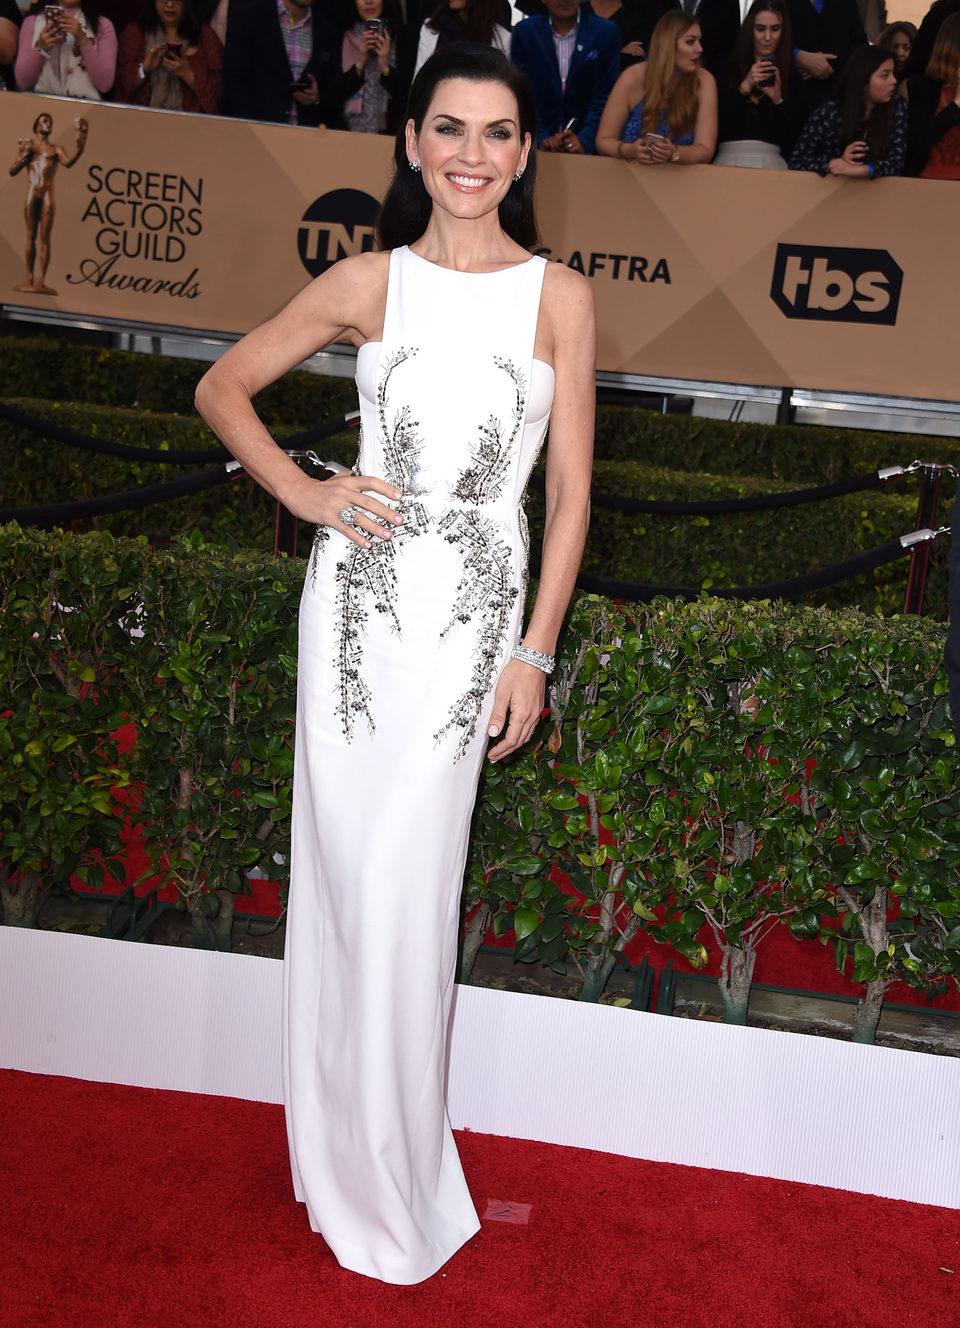 Julianna Margulies en la alfombra roja de los SAG Awards 2016